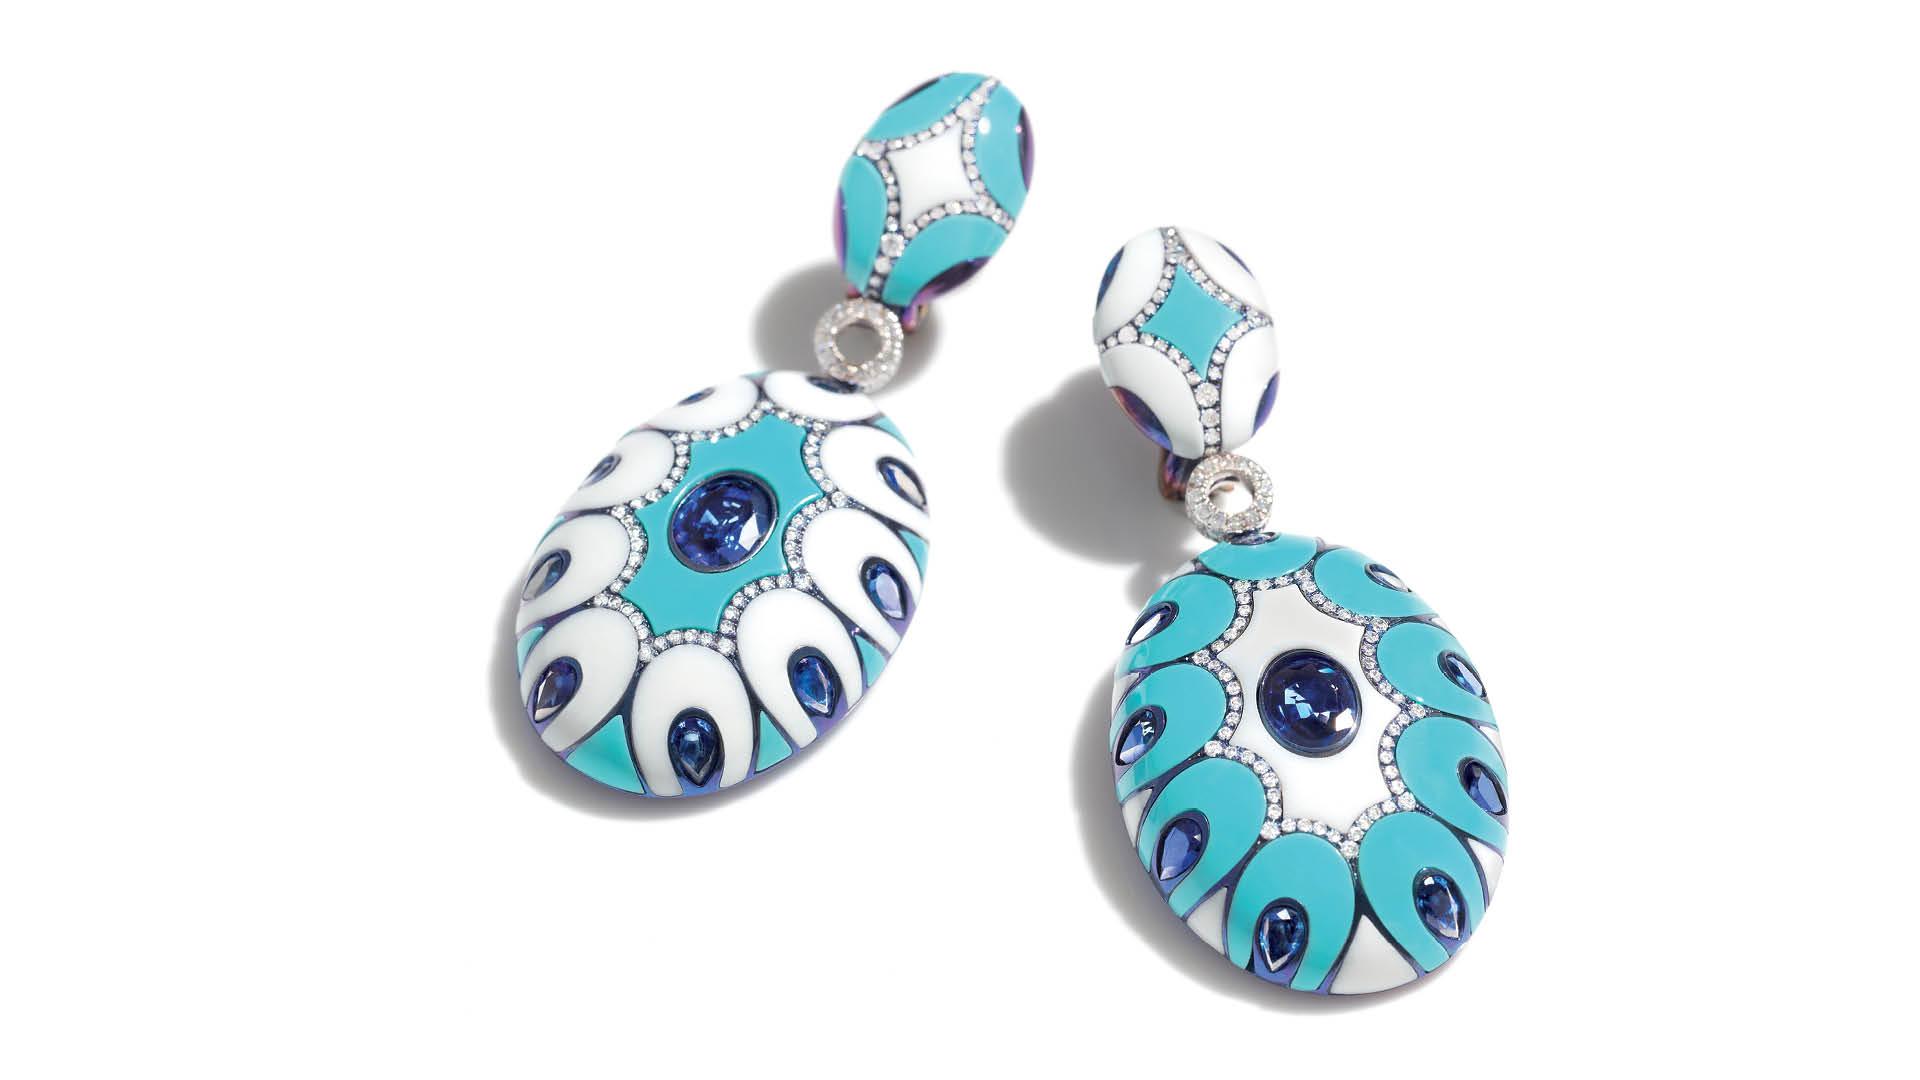 Chantecler-Maiolica-High-Jewellery-Earrings